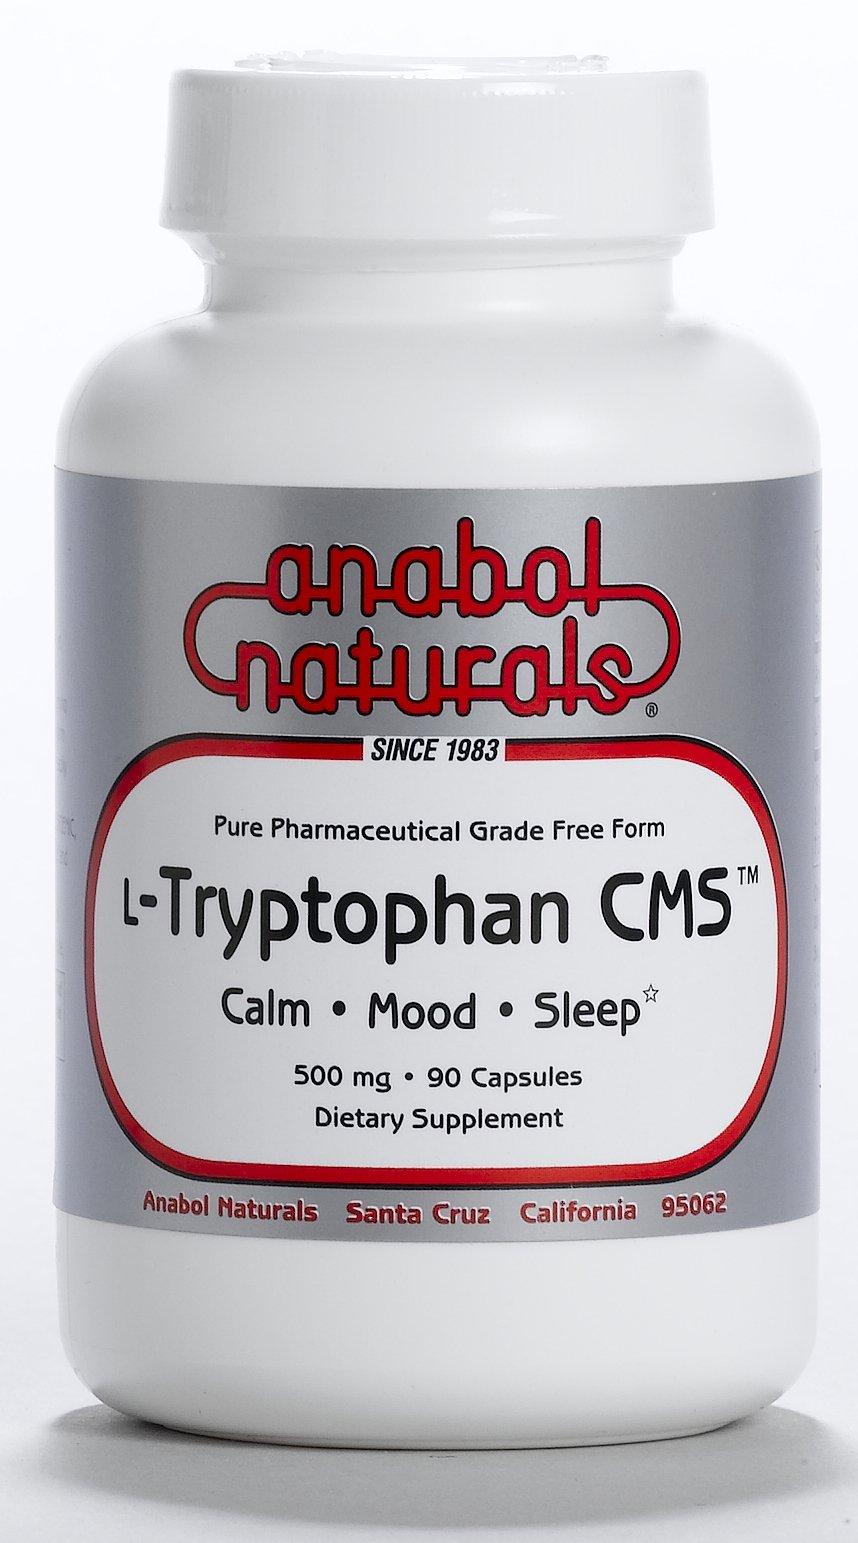 Anabol Naturals L-Tryptophan CMS Calm Mood Sleep 500mg 360 Caps